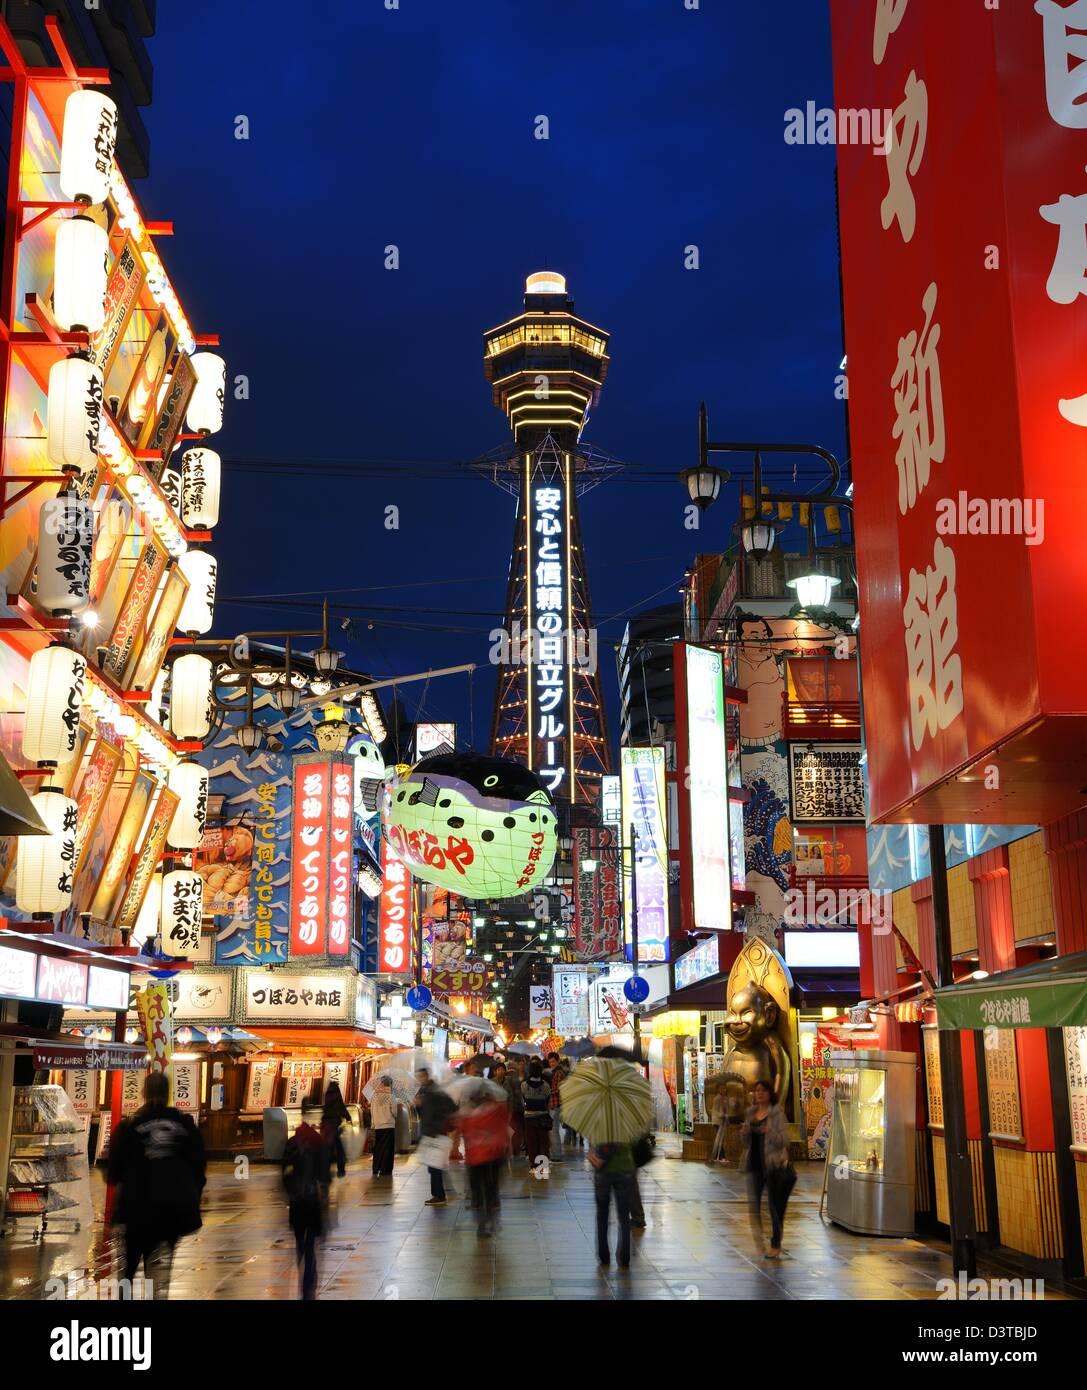 Quartier Shinsekai d'Osaka, au Japon. Photo Stock